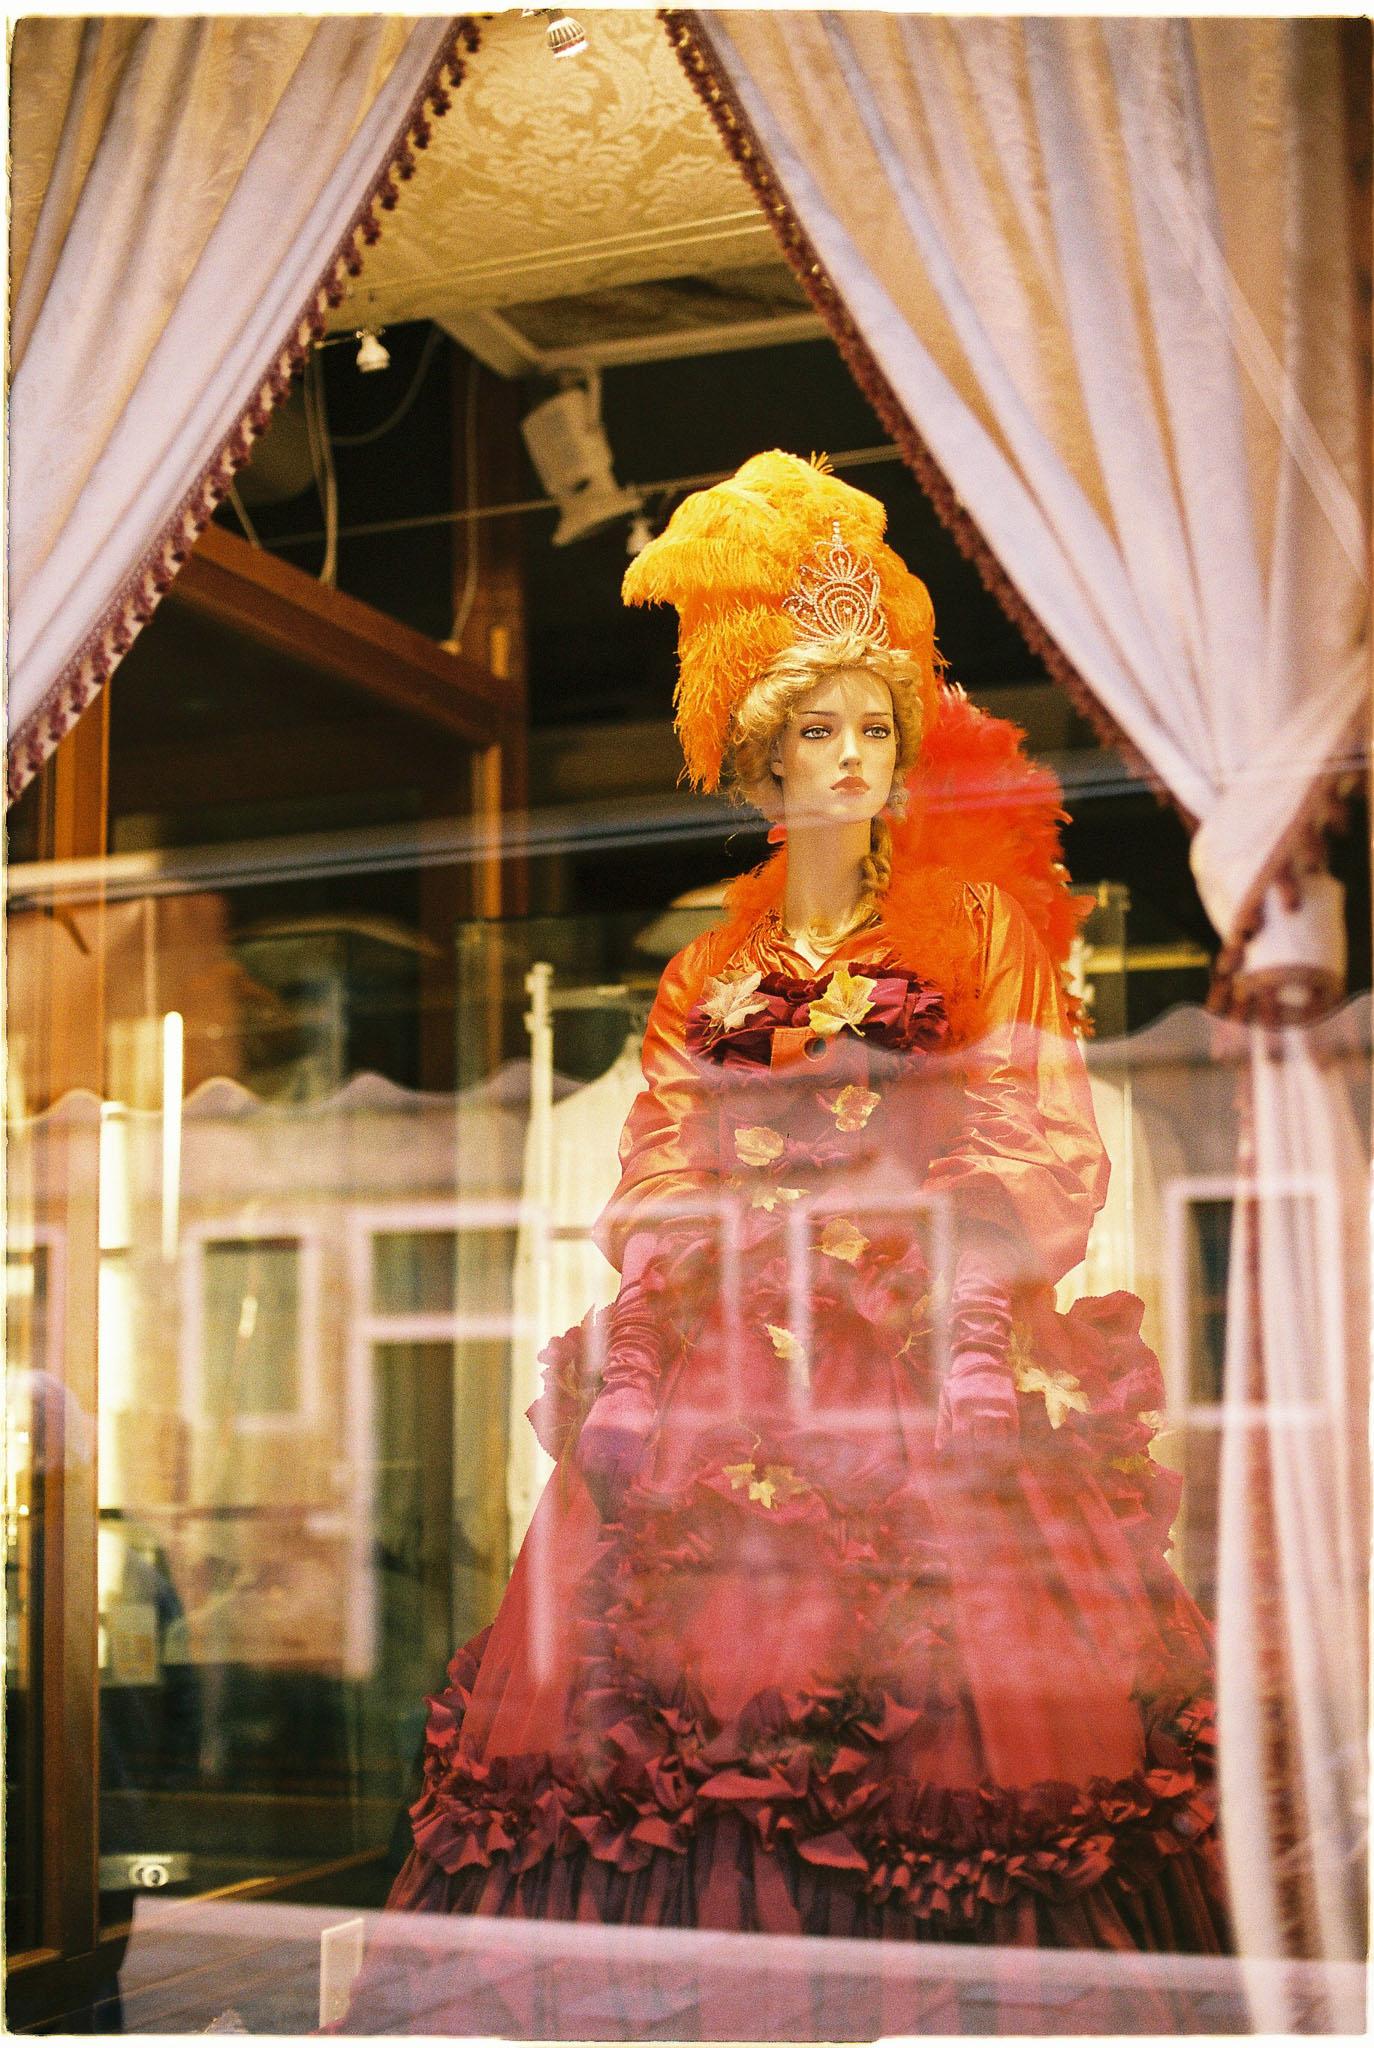 Venice shops - Agfa Vista400